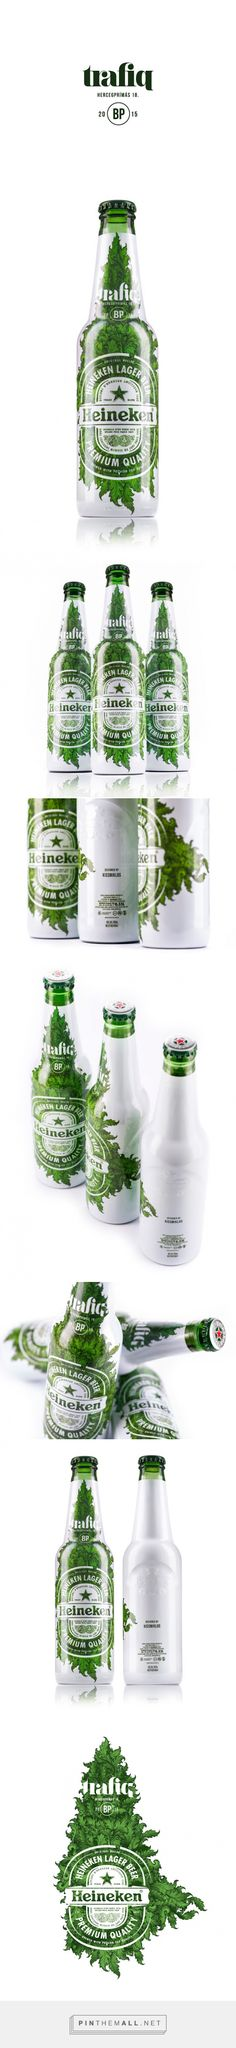 Trafiq Club Heineken Limited Edition Packaging designed by kissmiklos  - http://www.packagingoftheworld.com/2015/10/trafiq-club-heineken-limited-edition.html